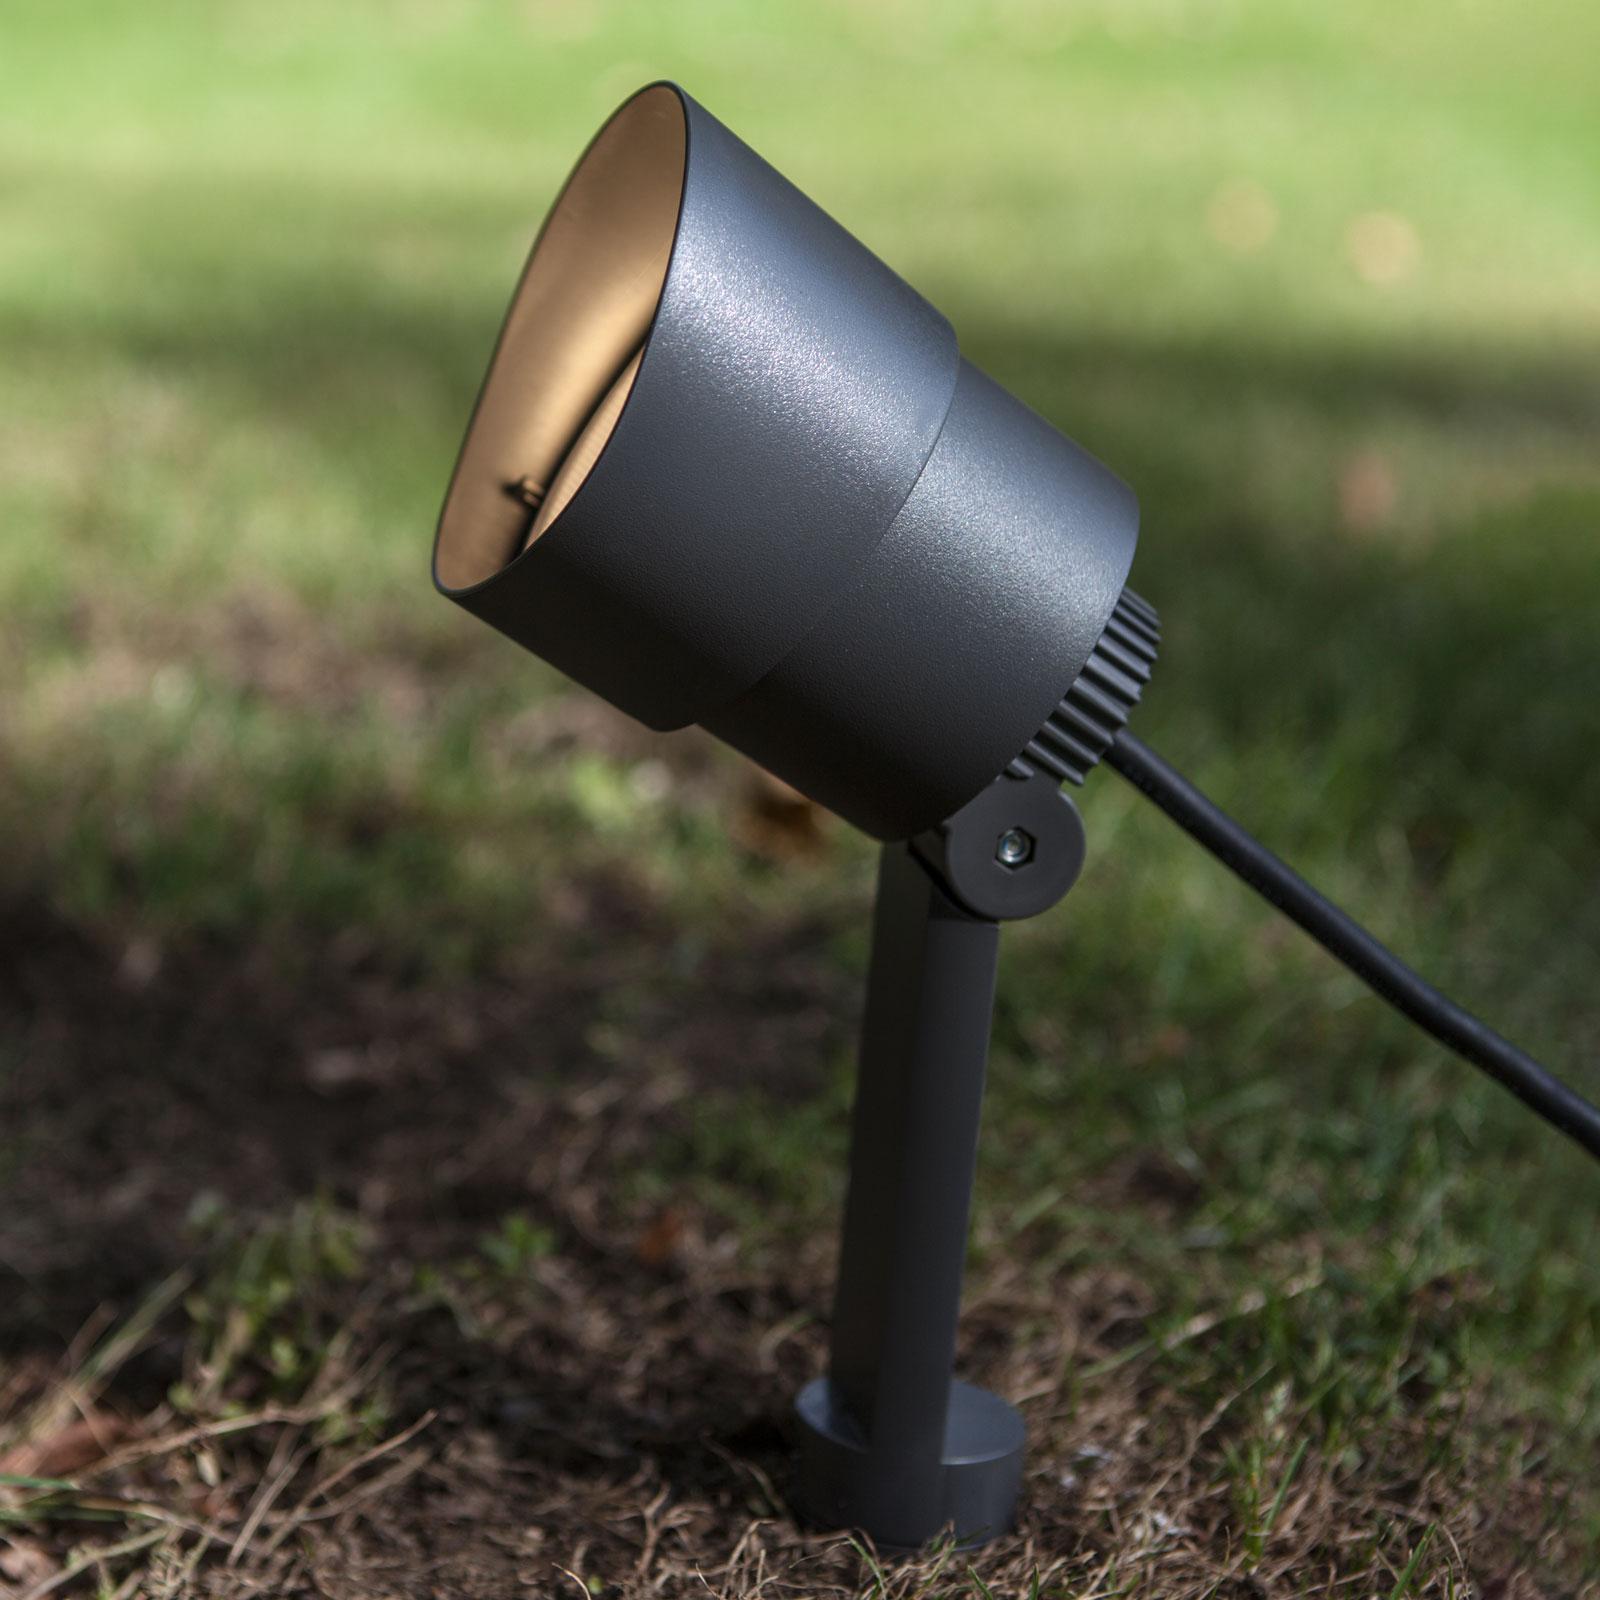 WiZ LED-lampe med jordspyd Explorer